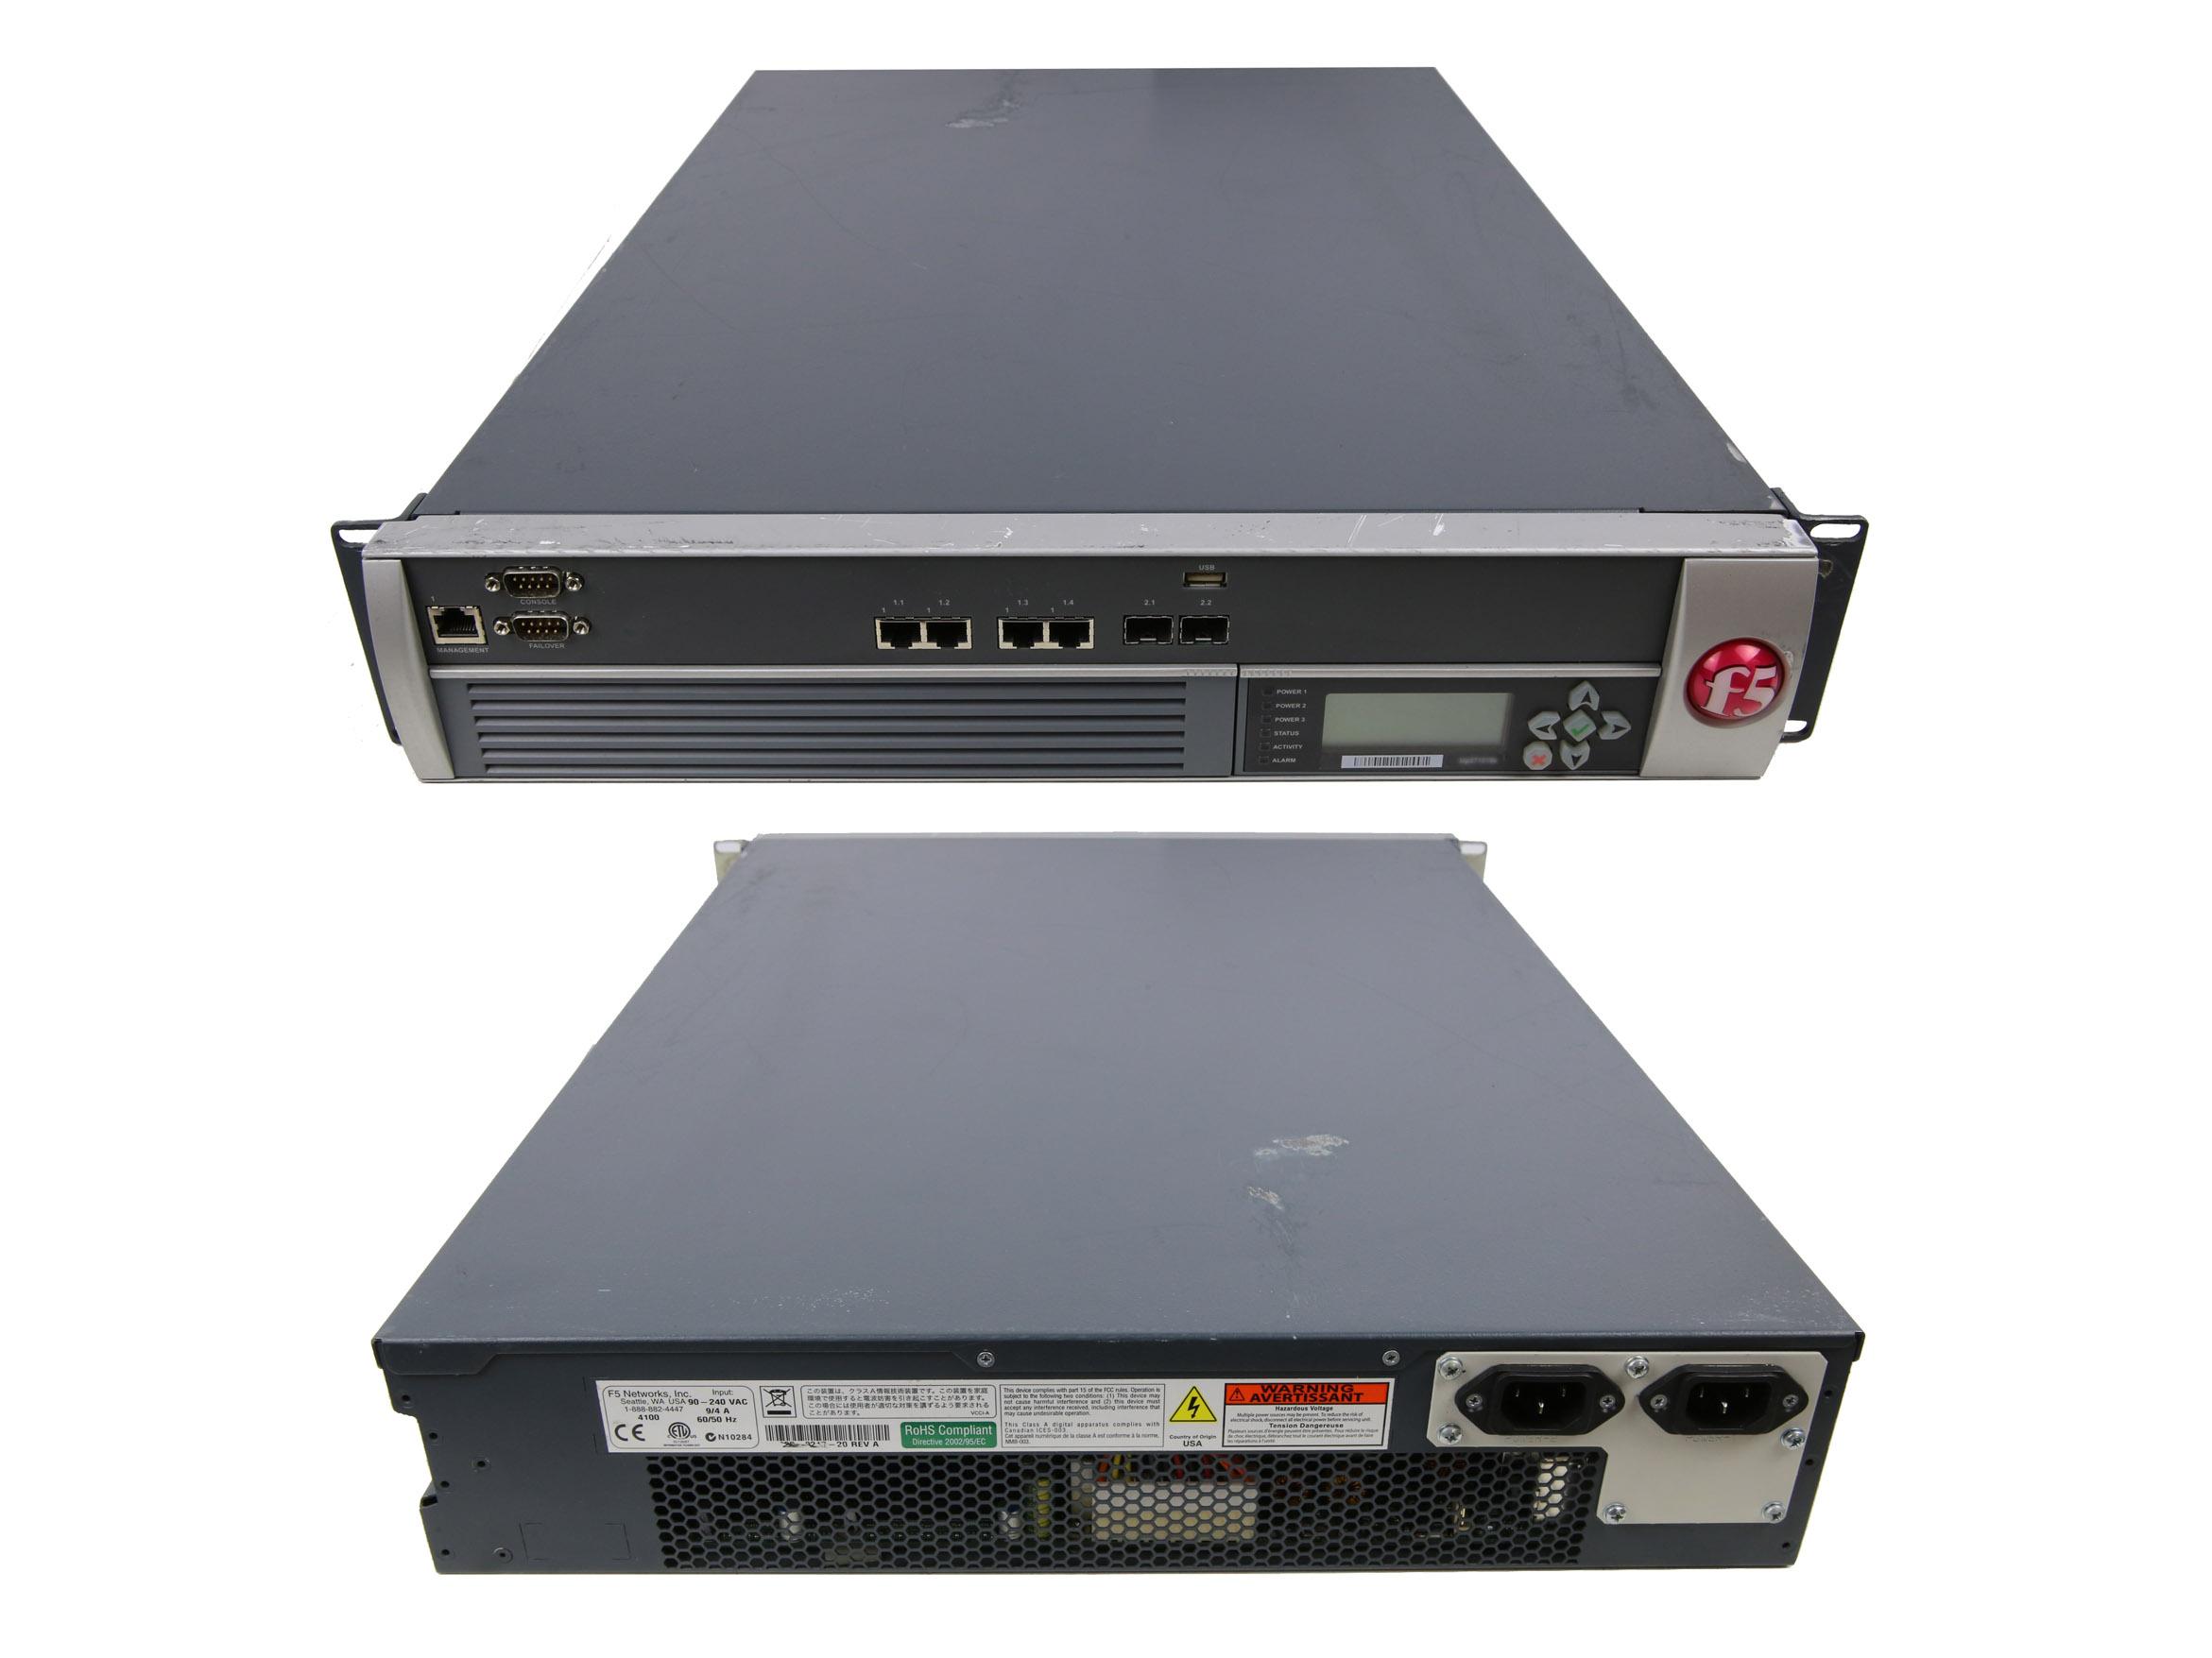 Details about Firewall 200-0217-20 REV A F5 Network FirePass 4100 4Port  1Gbits 2Port 1GbitsSFP